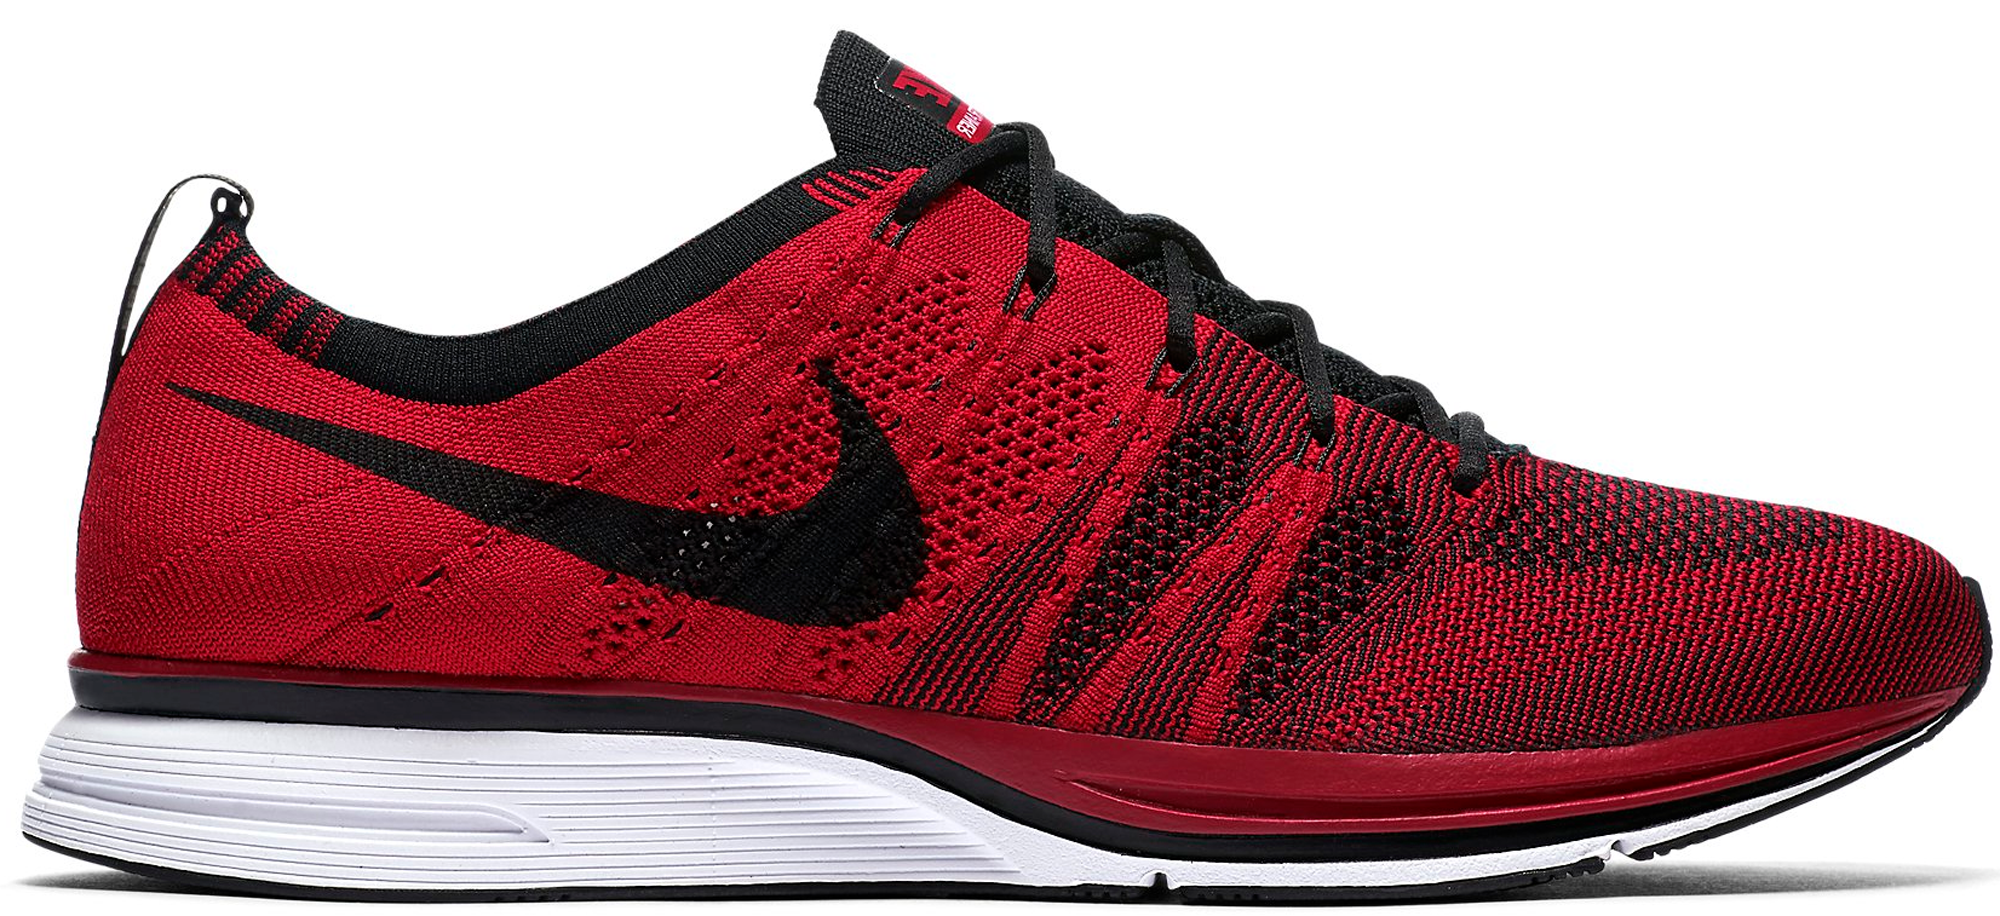 Nike Flyknit Trainer University Red (2018)